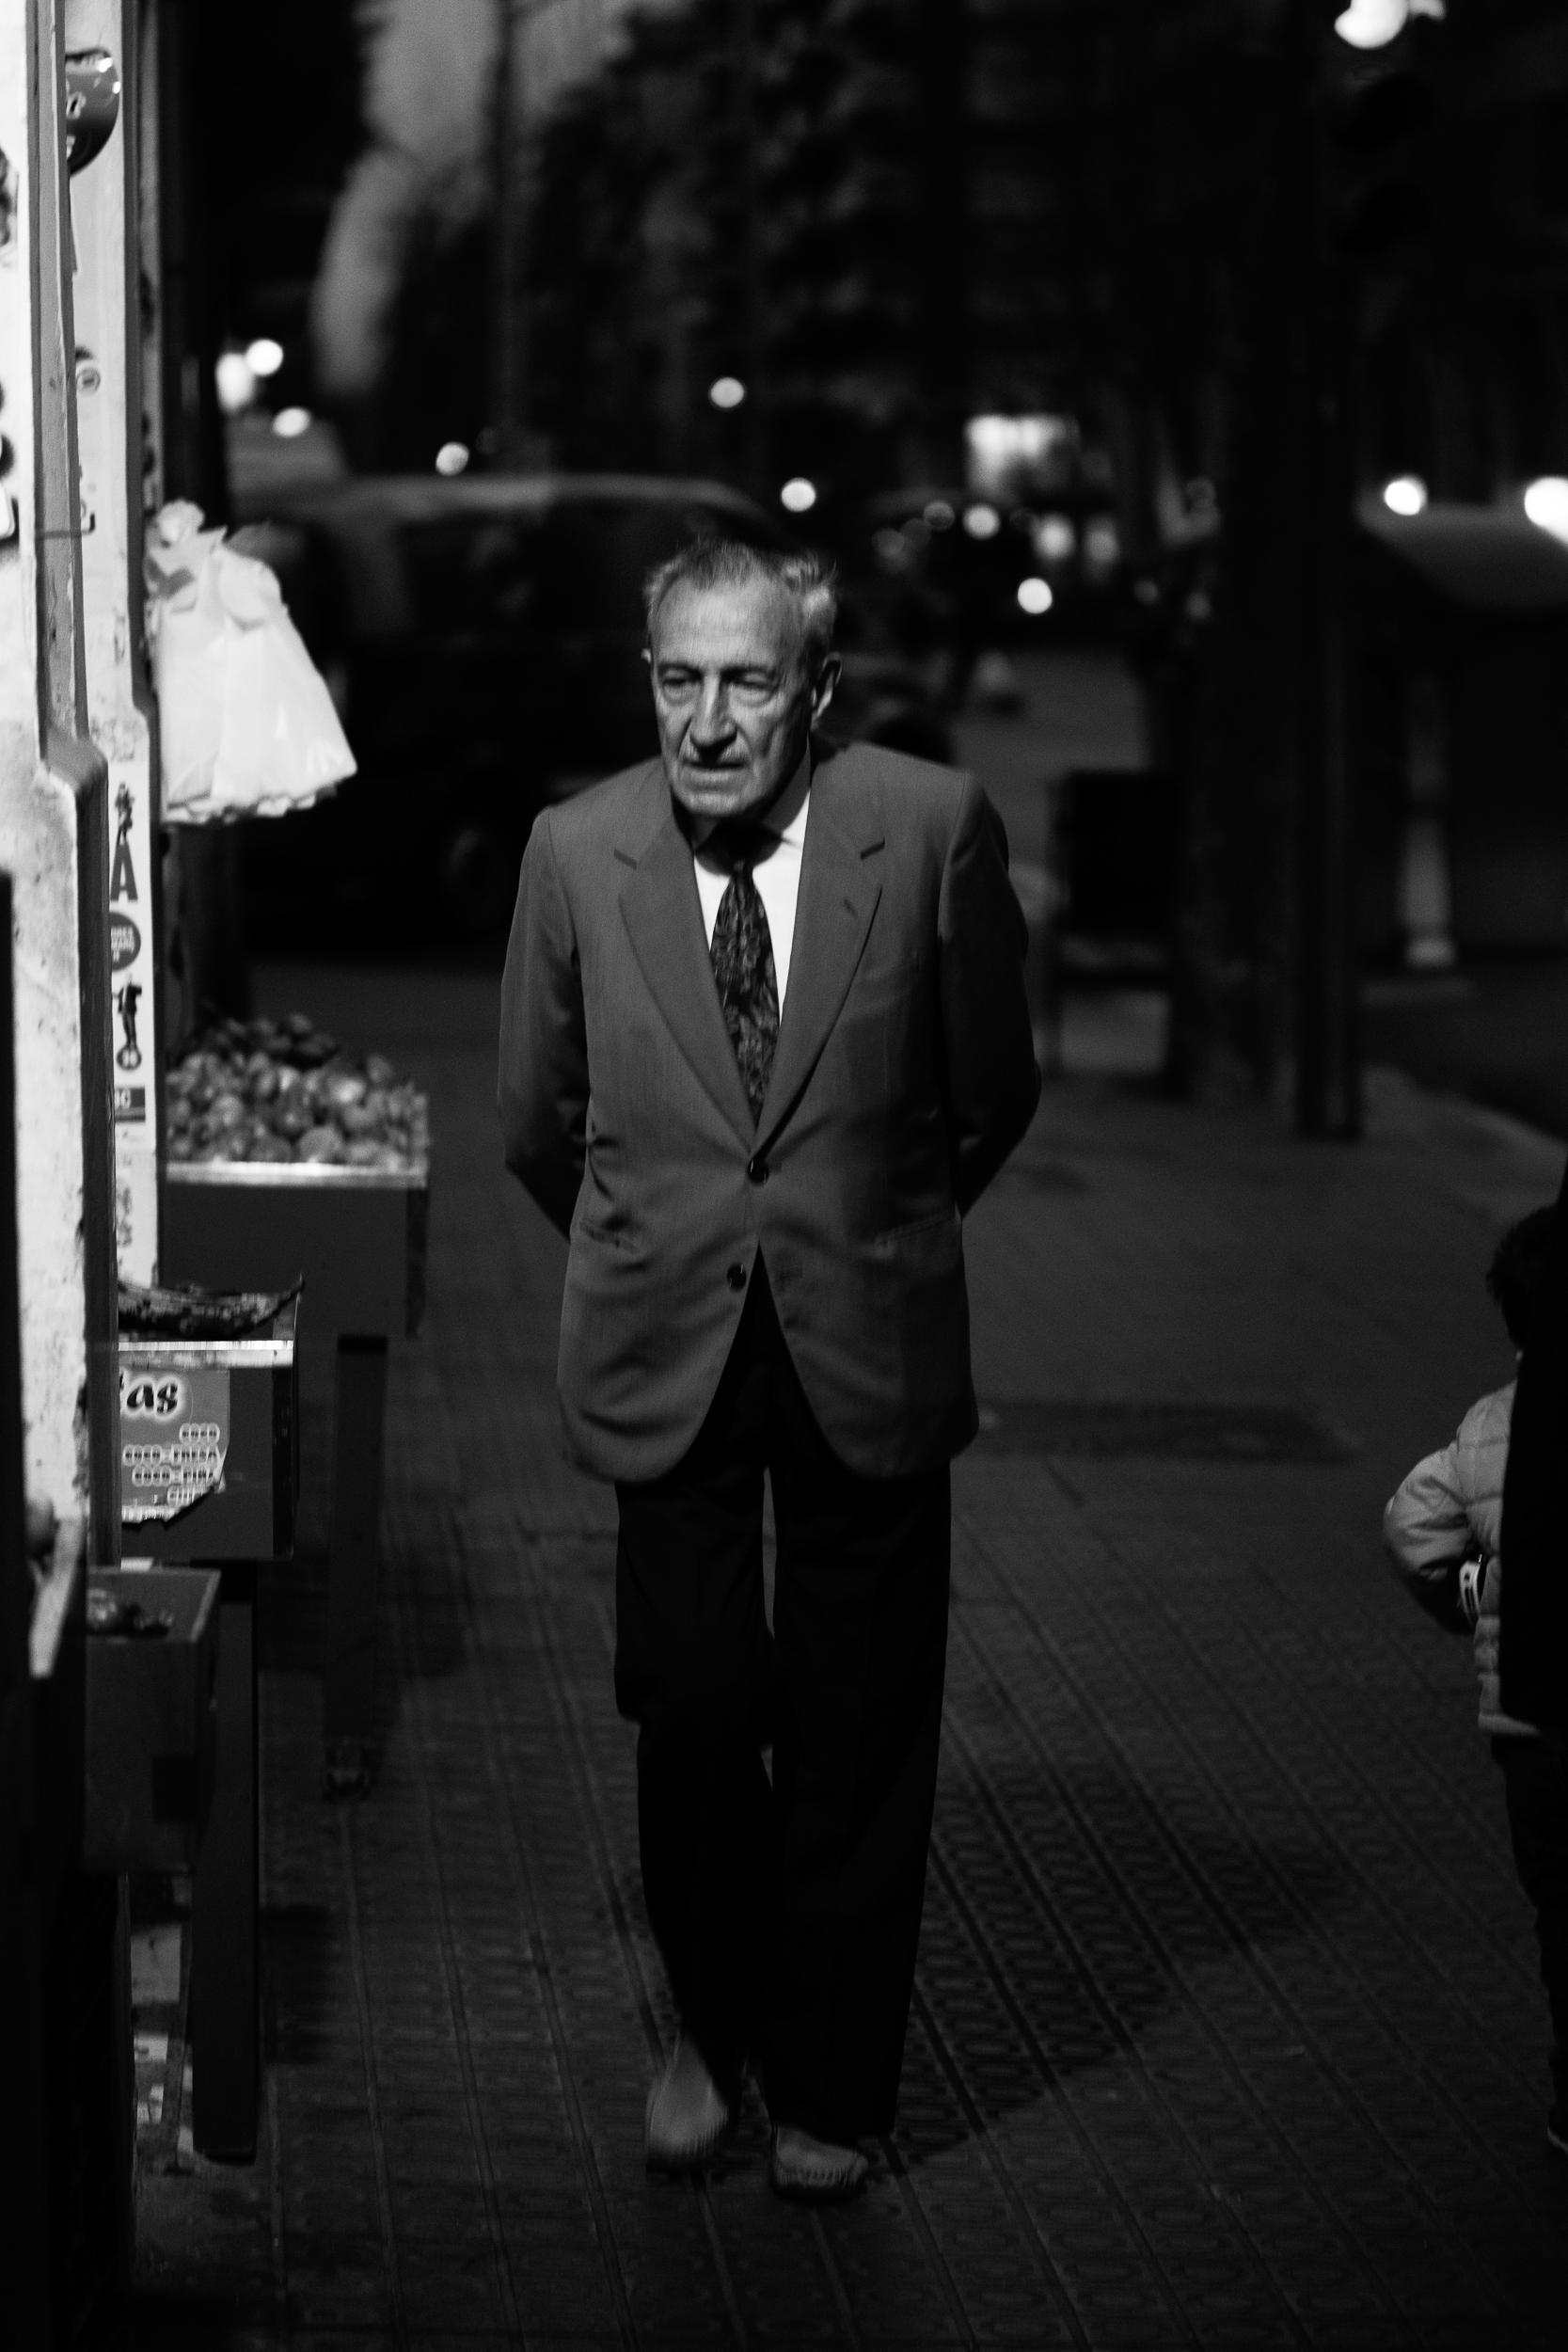 Chacon Images_Barcelona_Street_WEB_-3354.jpg